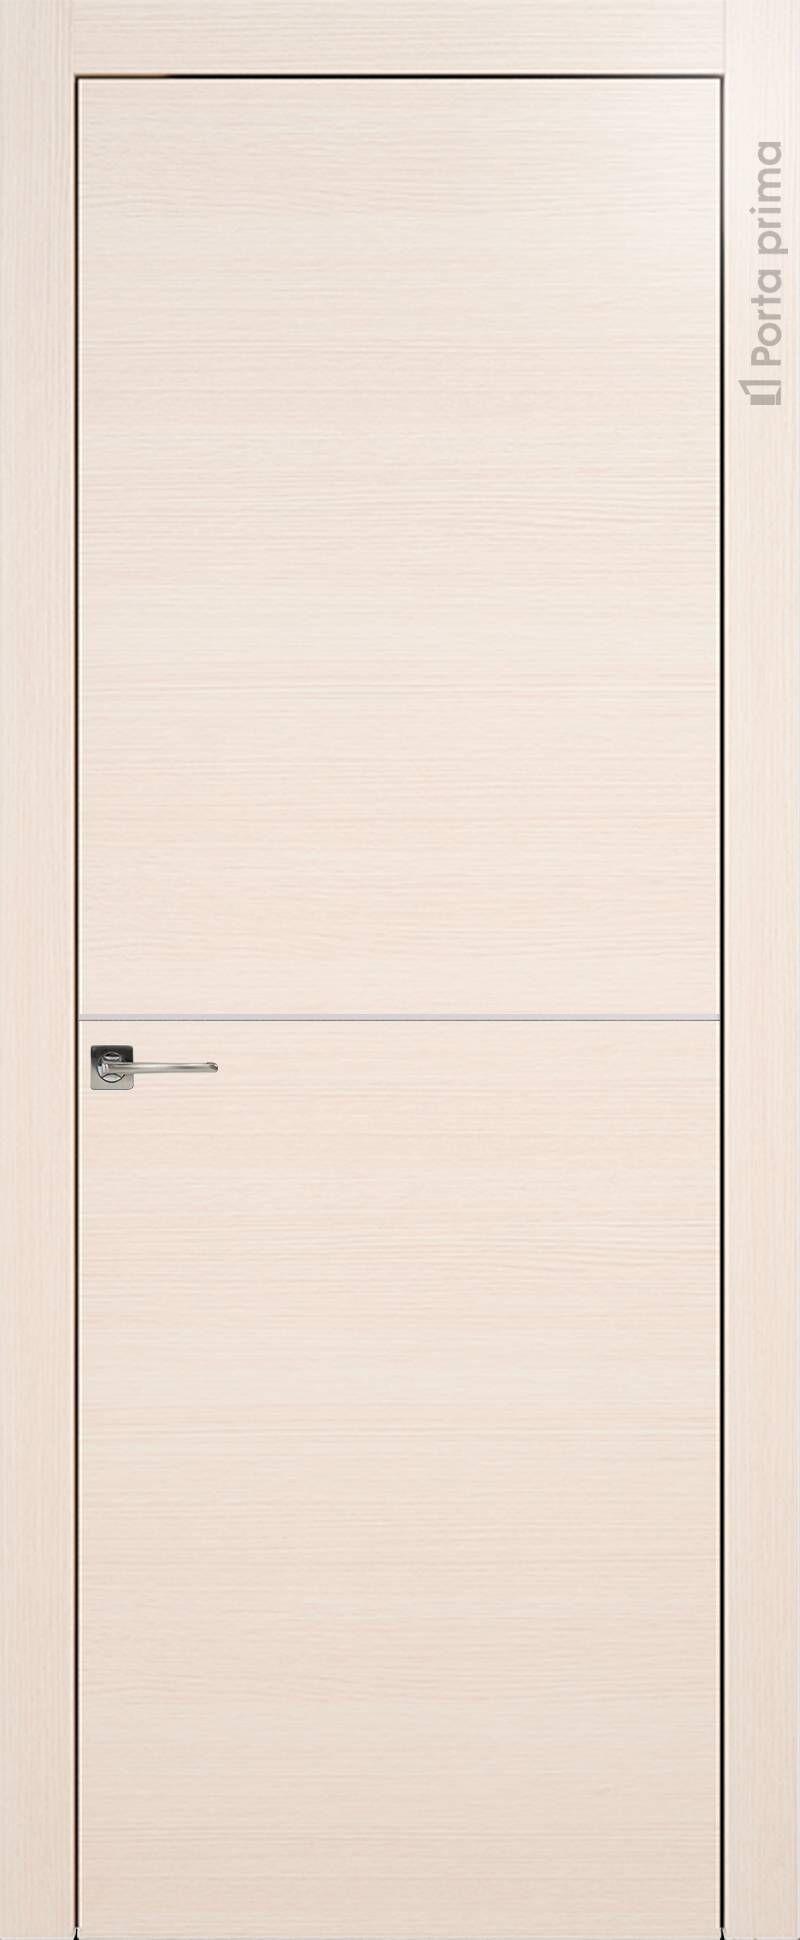 Tivoli Б-3 цвет - Беленый дуб Без стекла (ДГ)